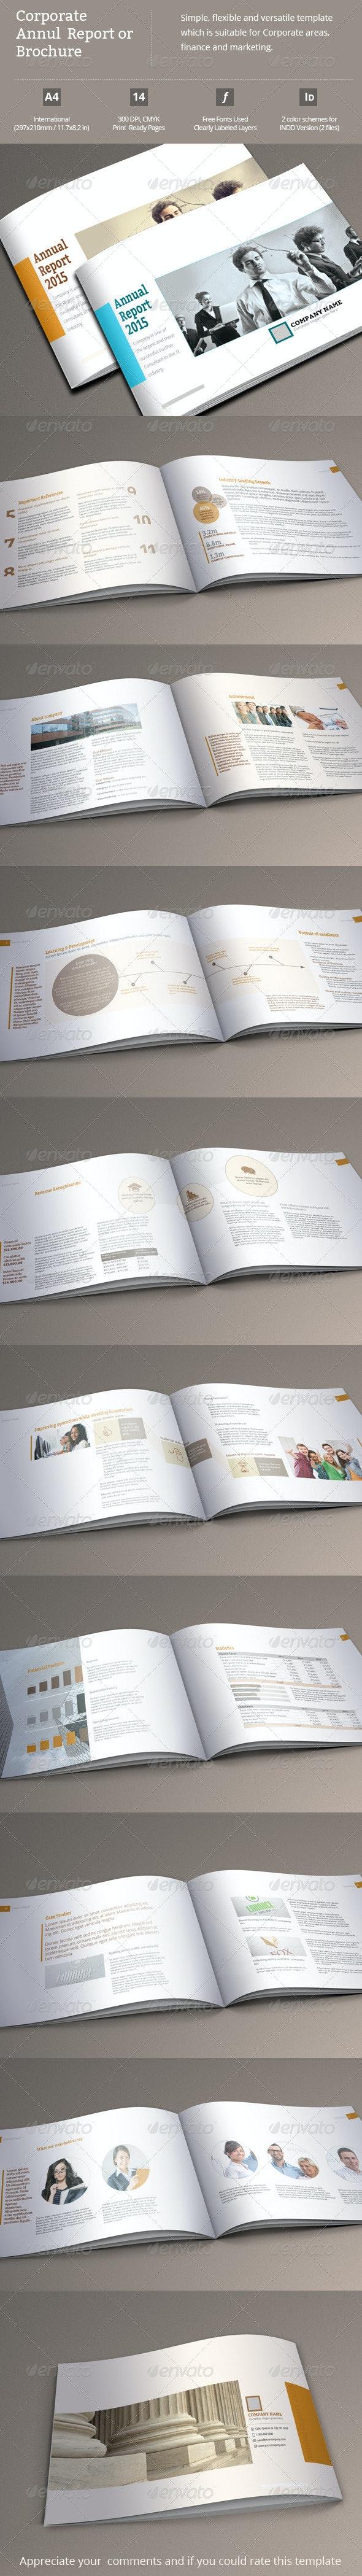 Corporate Annual Report or Brochure - Corporate Brochures